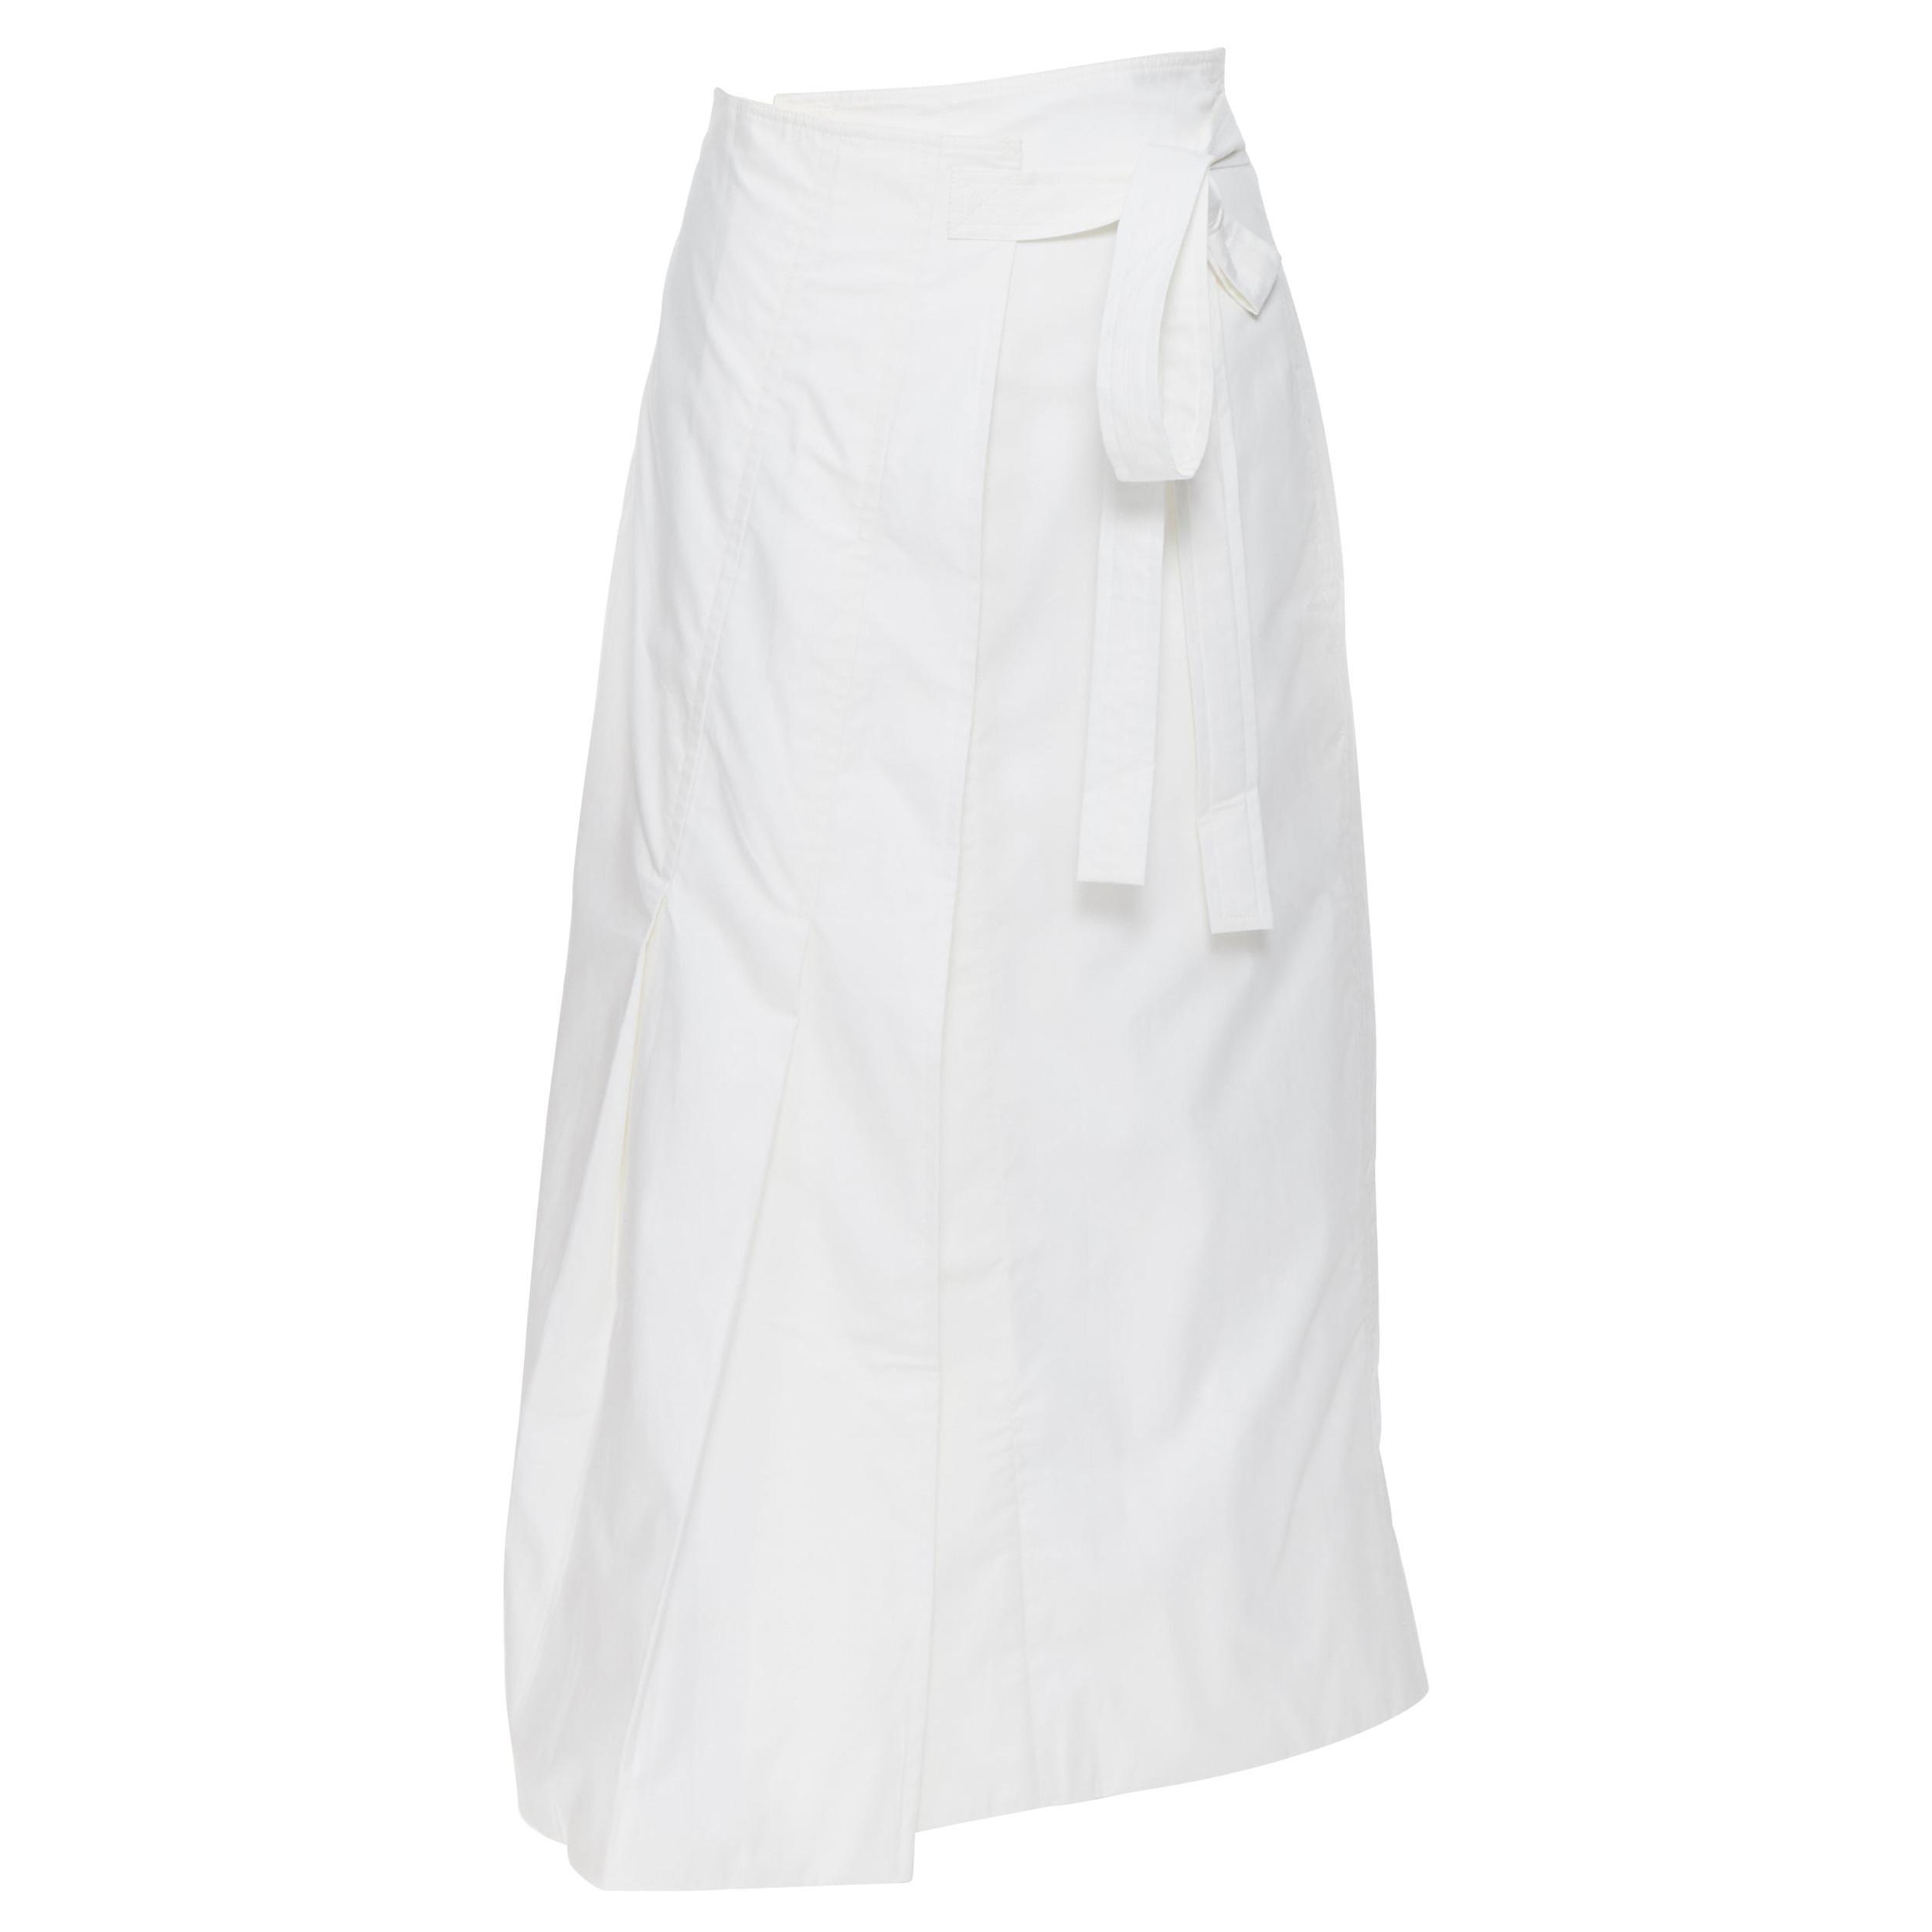 OLD CELINE PHOEBE PHILO white cotton wrap self tie darted midi skirt XS